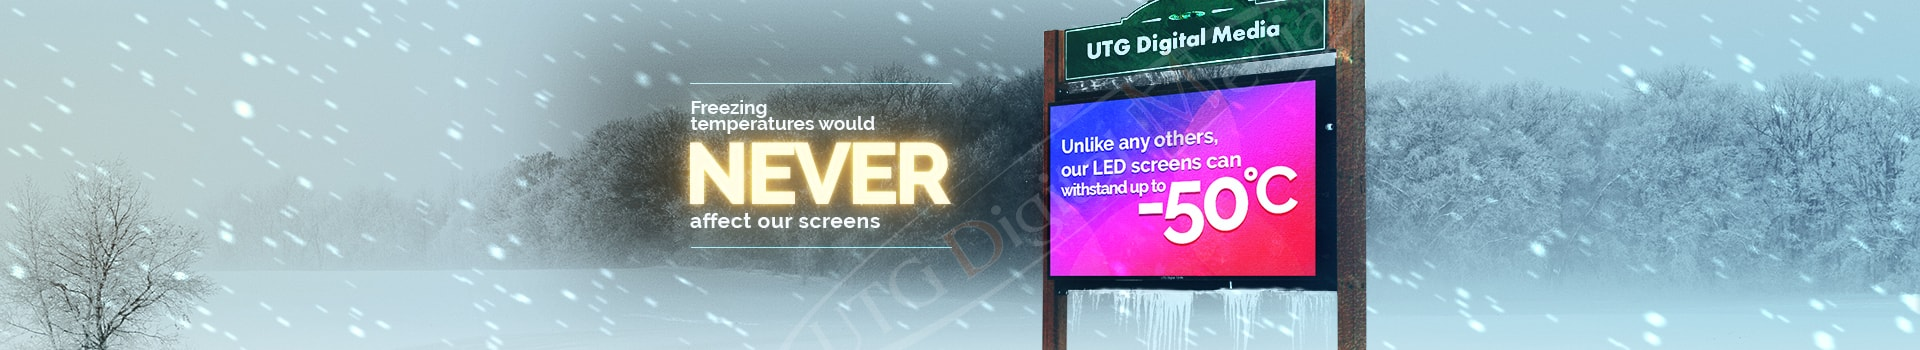 Outdoor LED Pylon from UTG Digital Media